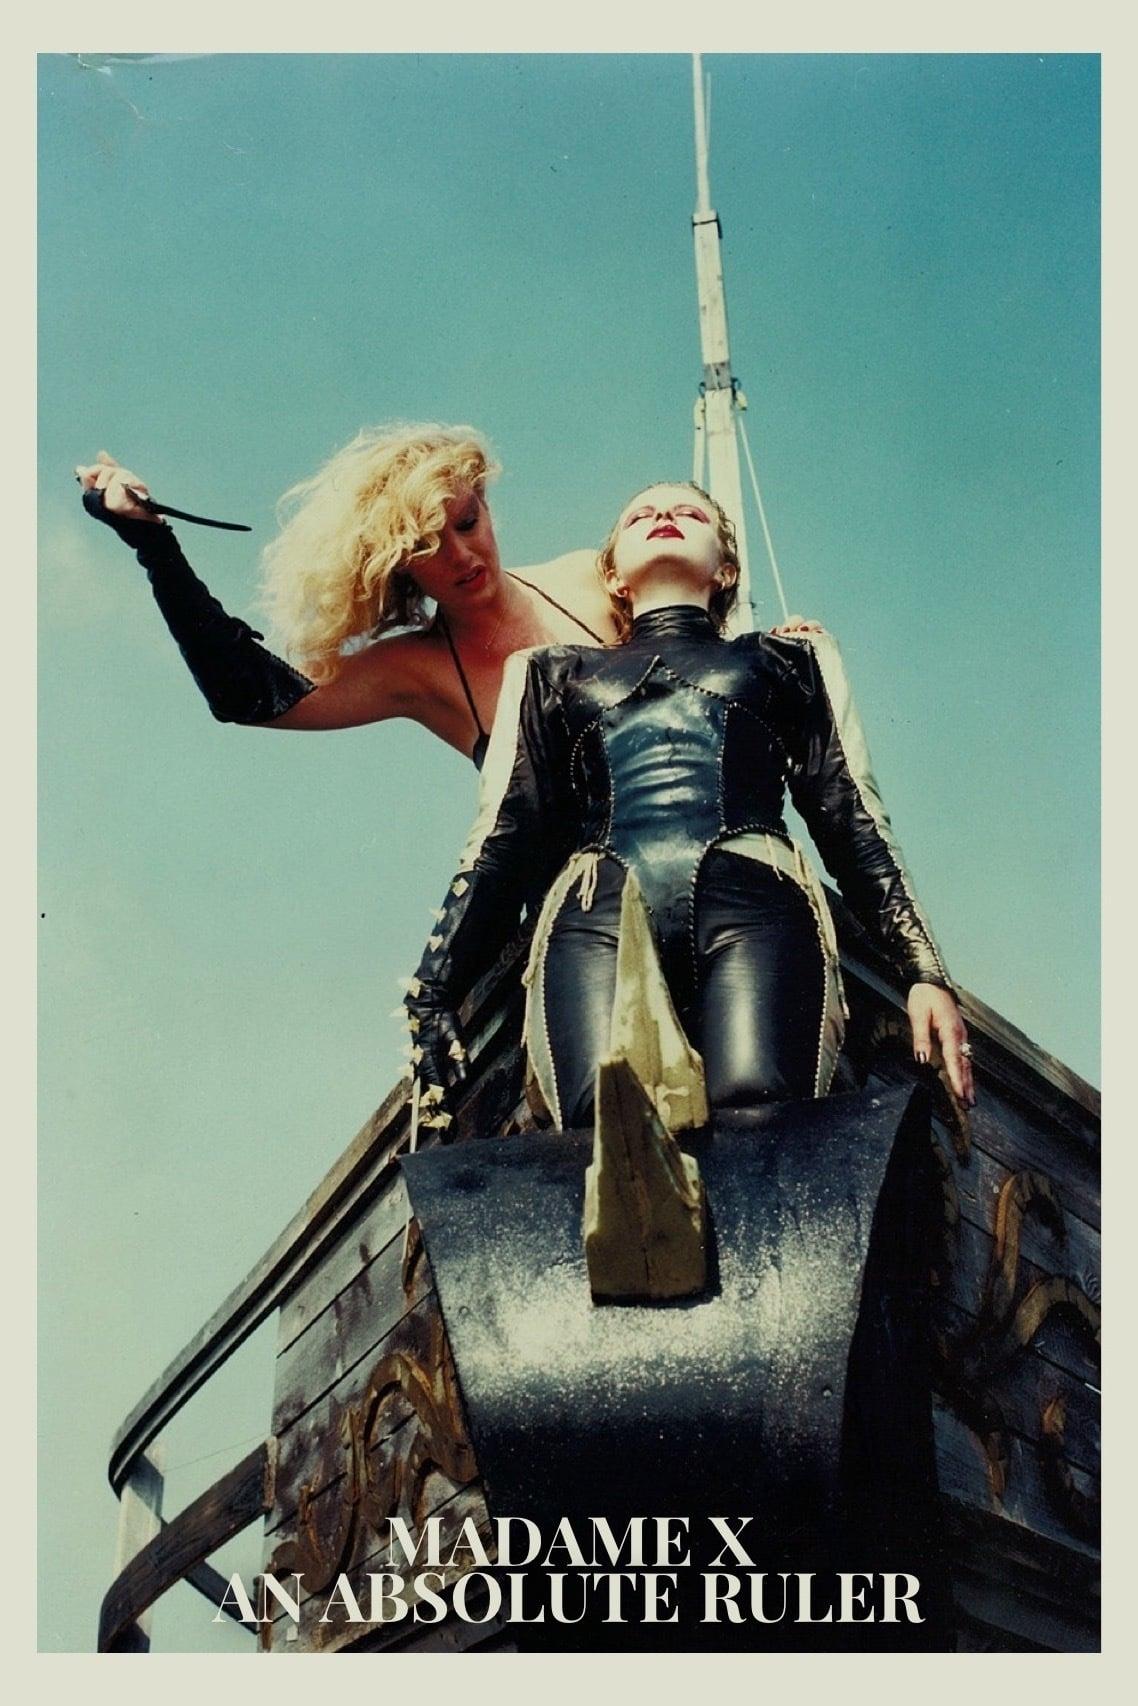 Madame X: An Absolute Ruler